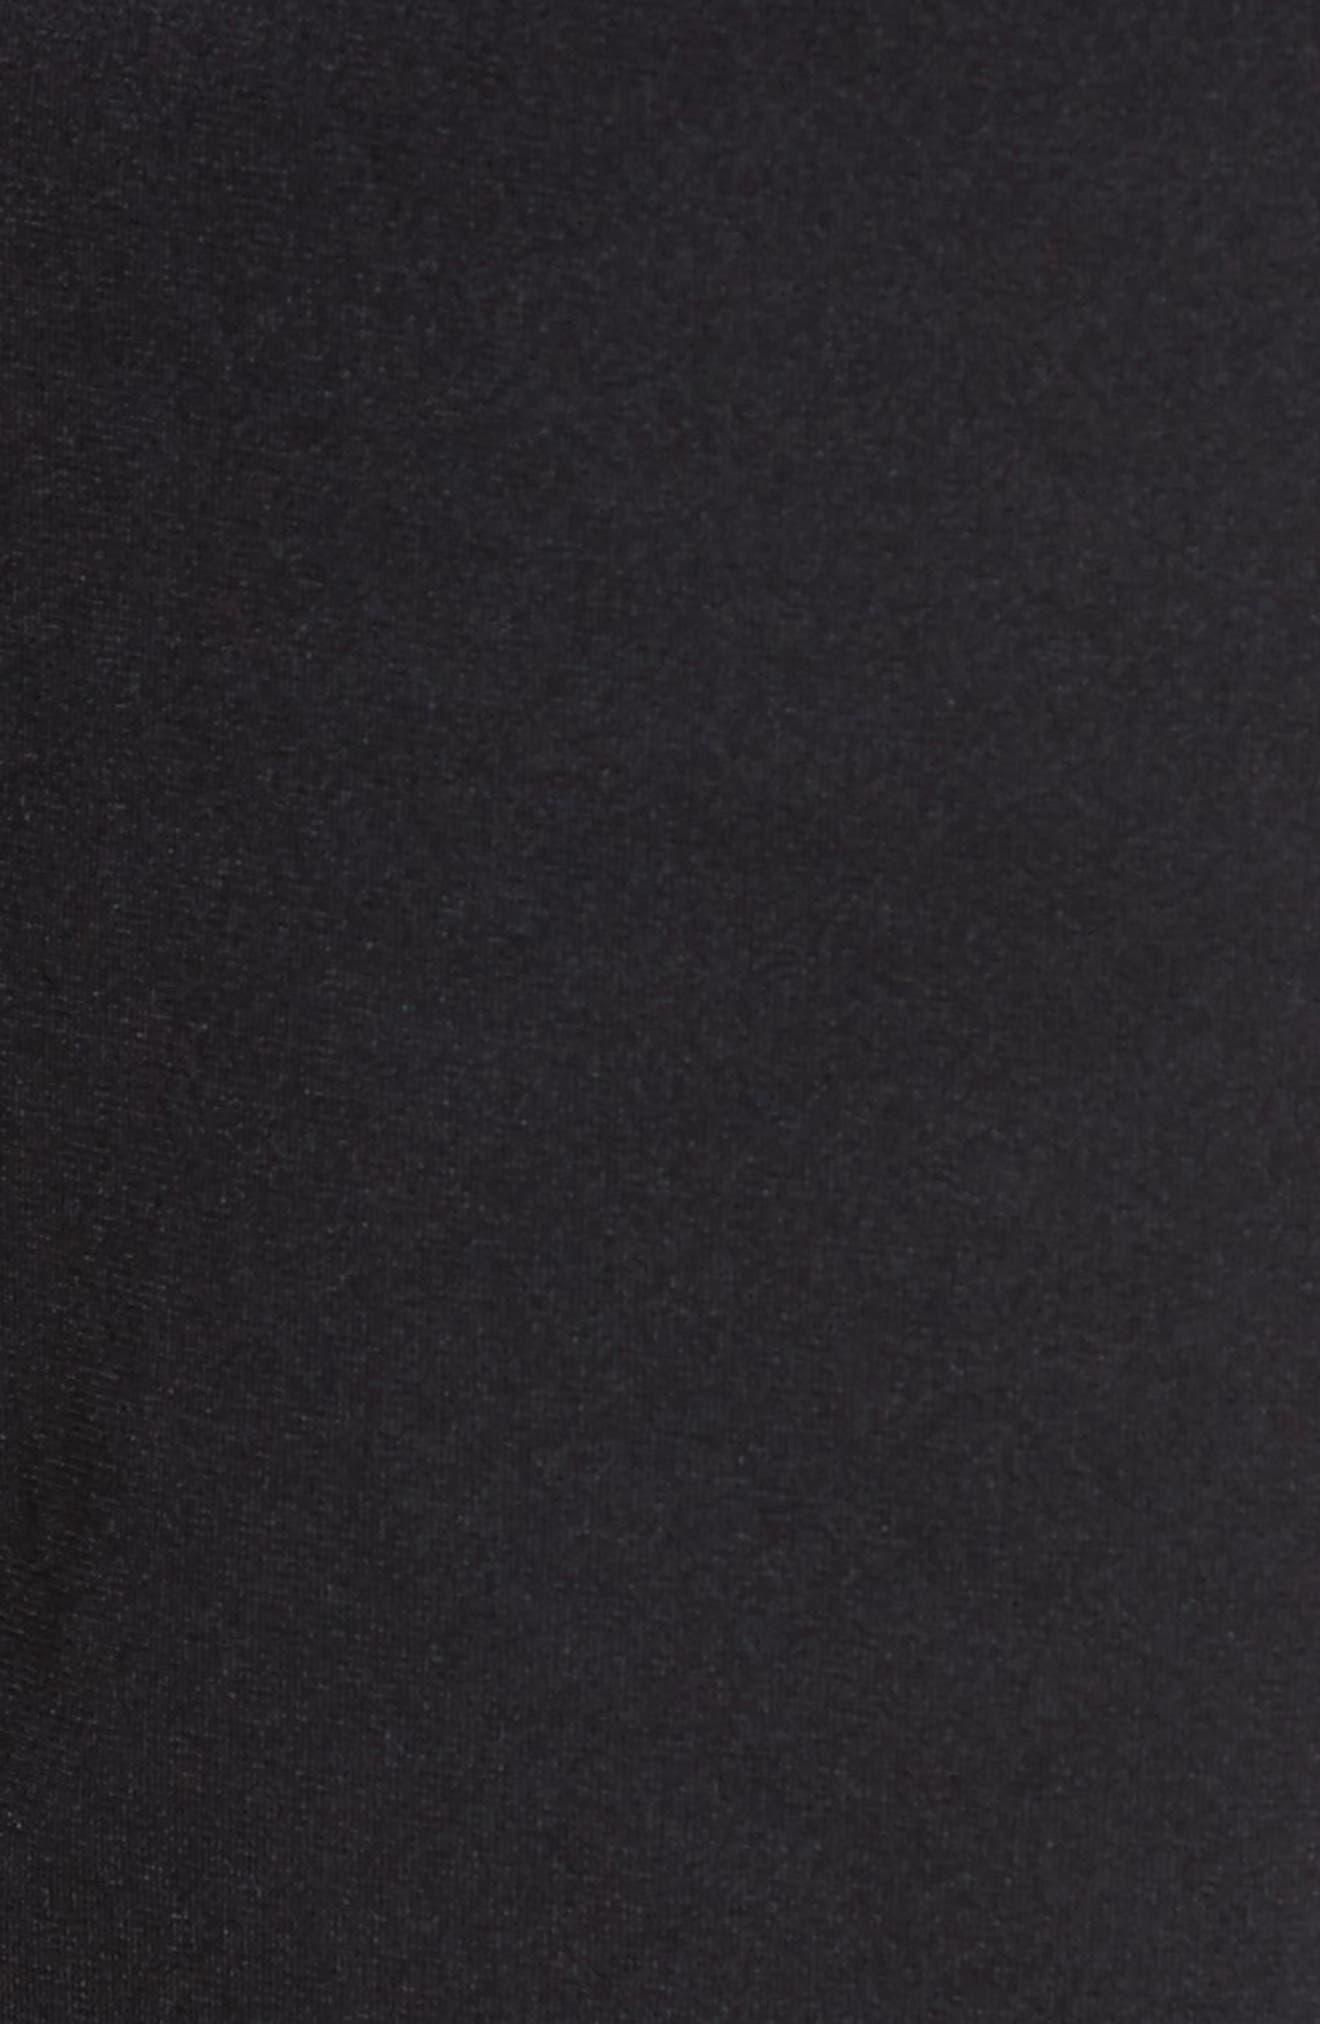 R18 Tech Pants,                             Alternate thumbnail 5, color,                             BLACK